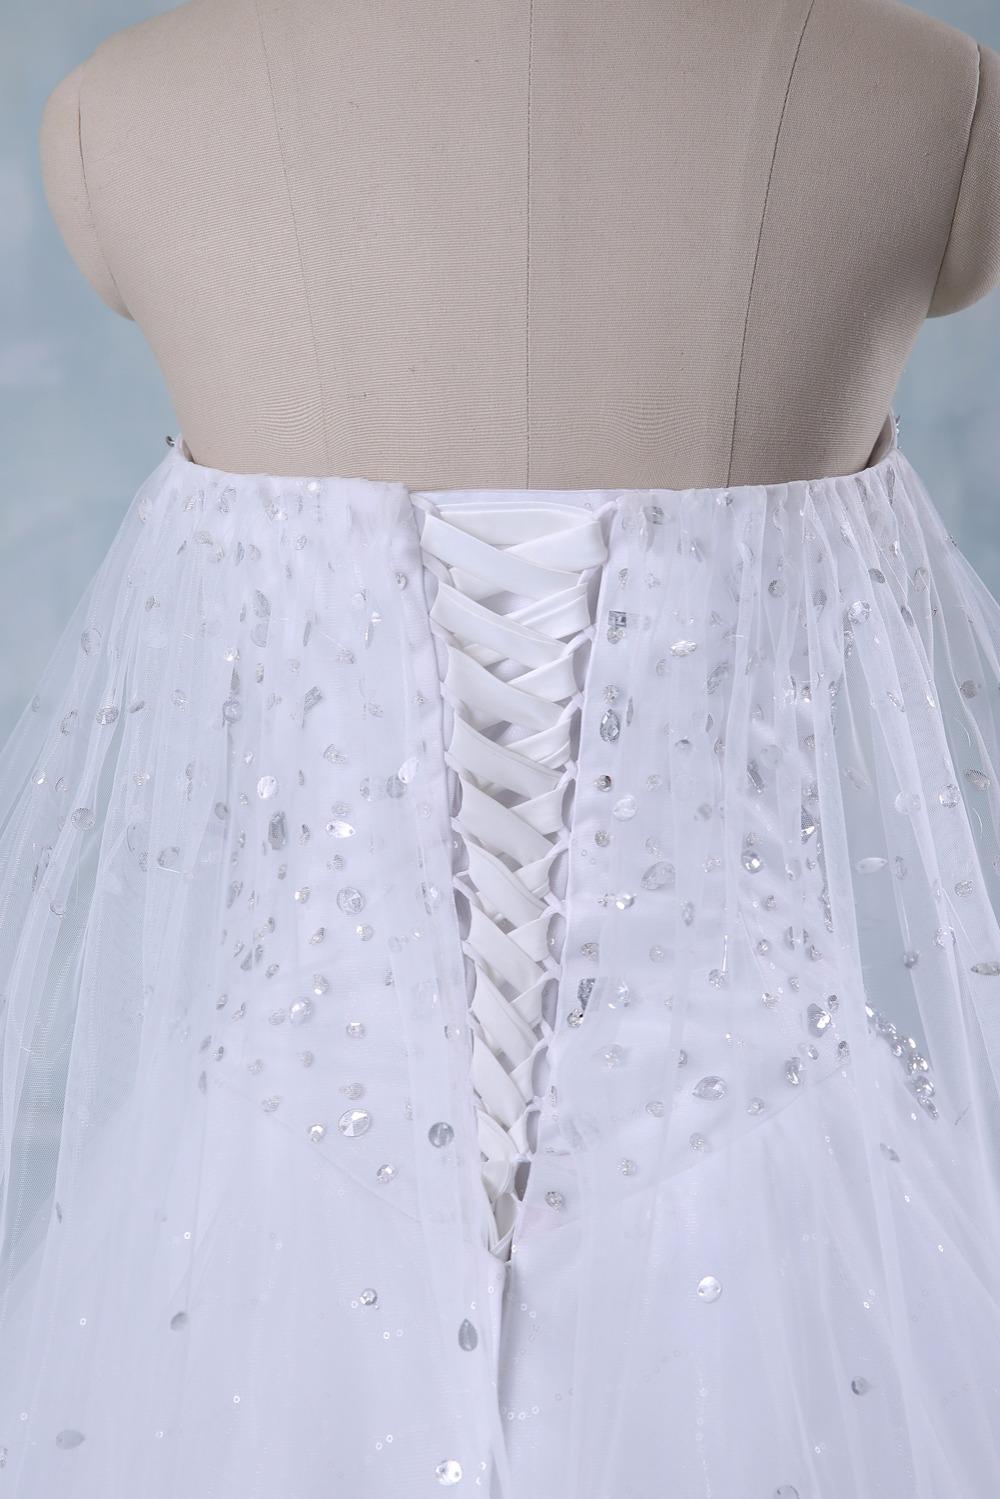 New Bandage Tube Top Crystal Luxury Wedding Dress Bridal gown wedding dresses vestido de noiva x71101 6